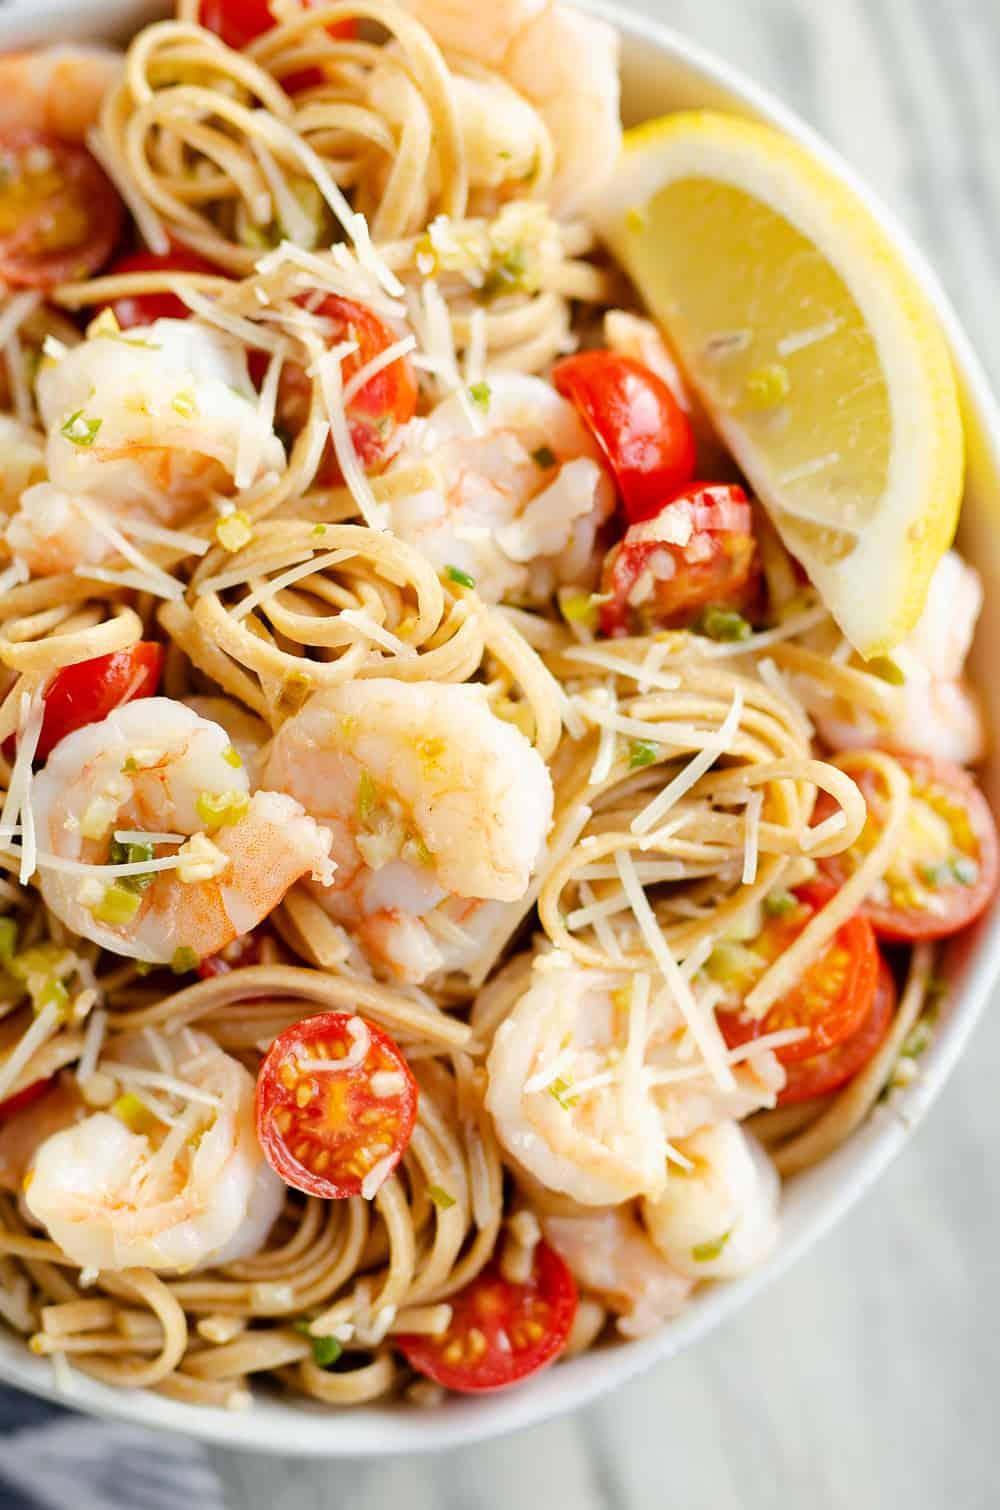 Parmesan Lemon Shrimp Linguinelarge bowl